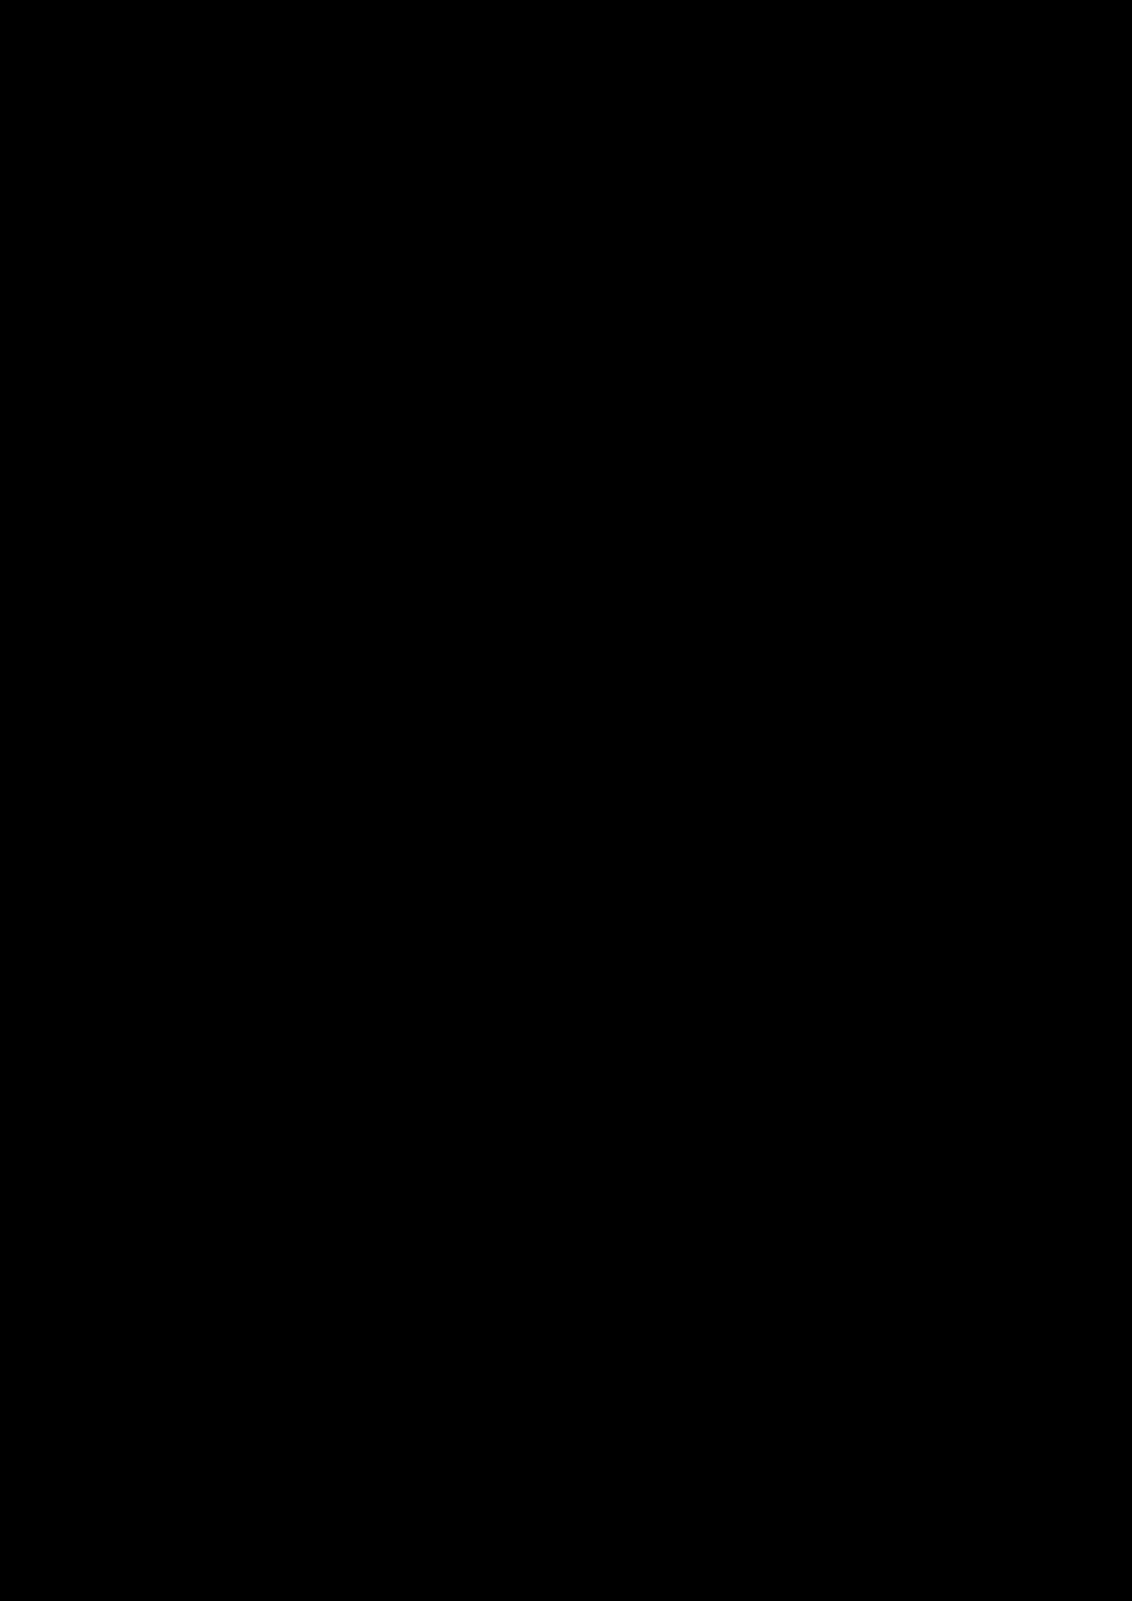 Belyiy sokol slide, Image 176